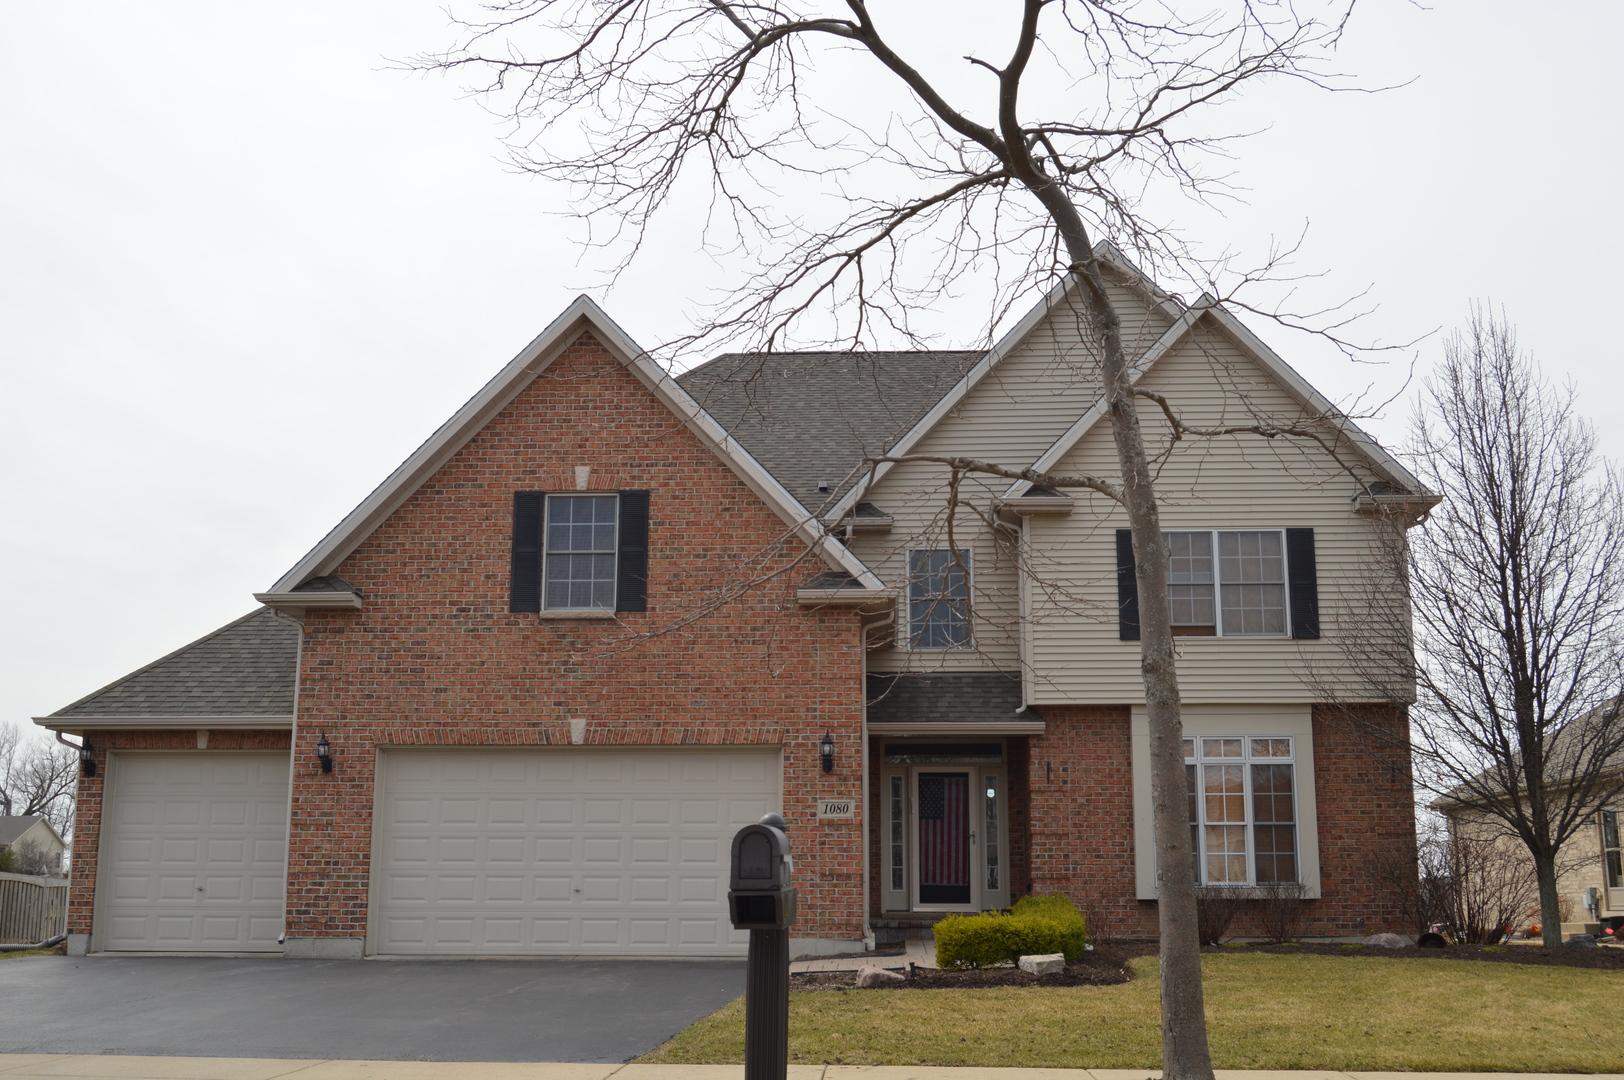 Property for sale at 1080 Grayhawk Drive, Algonquin,  IL 60102